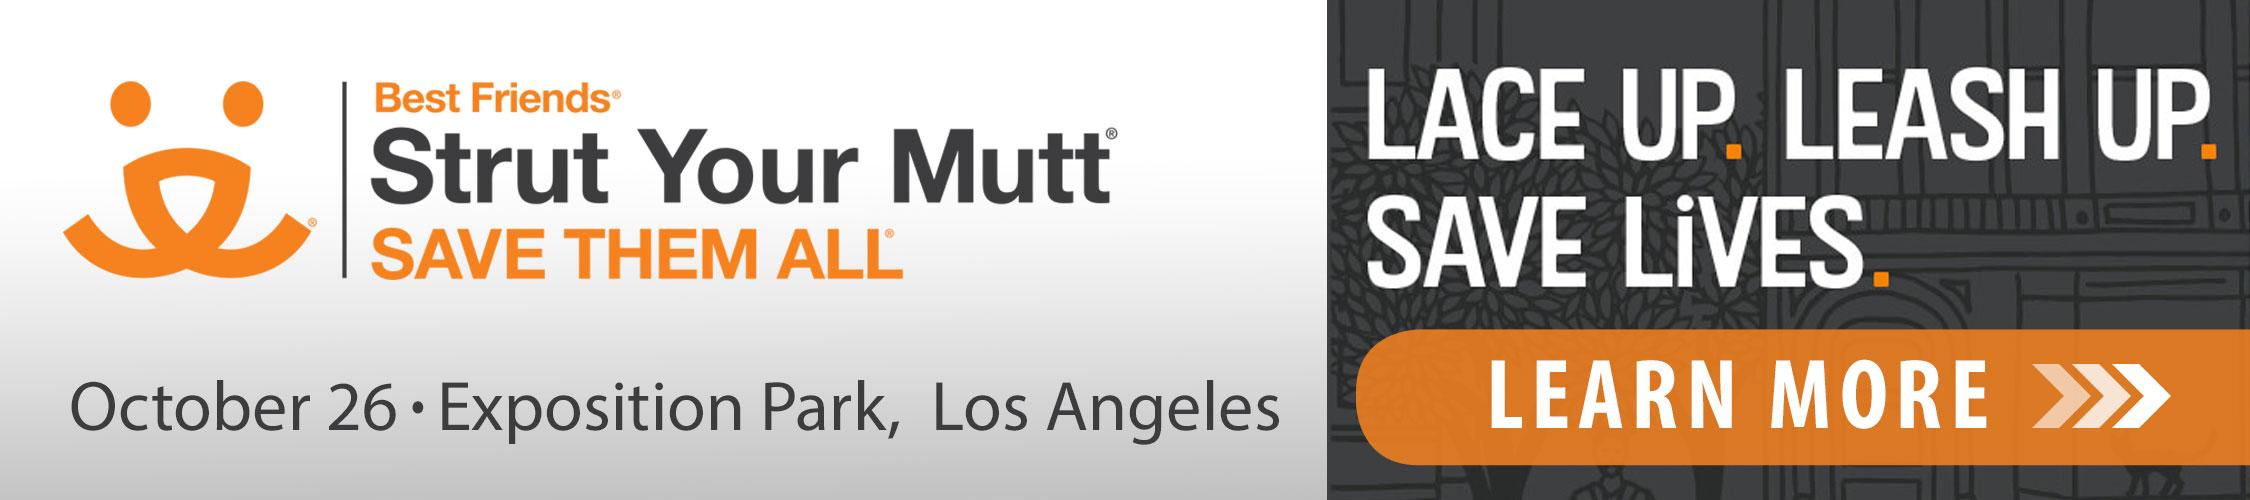 Strut Your Mutt 2019